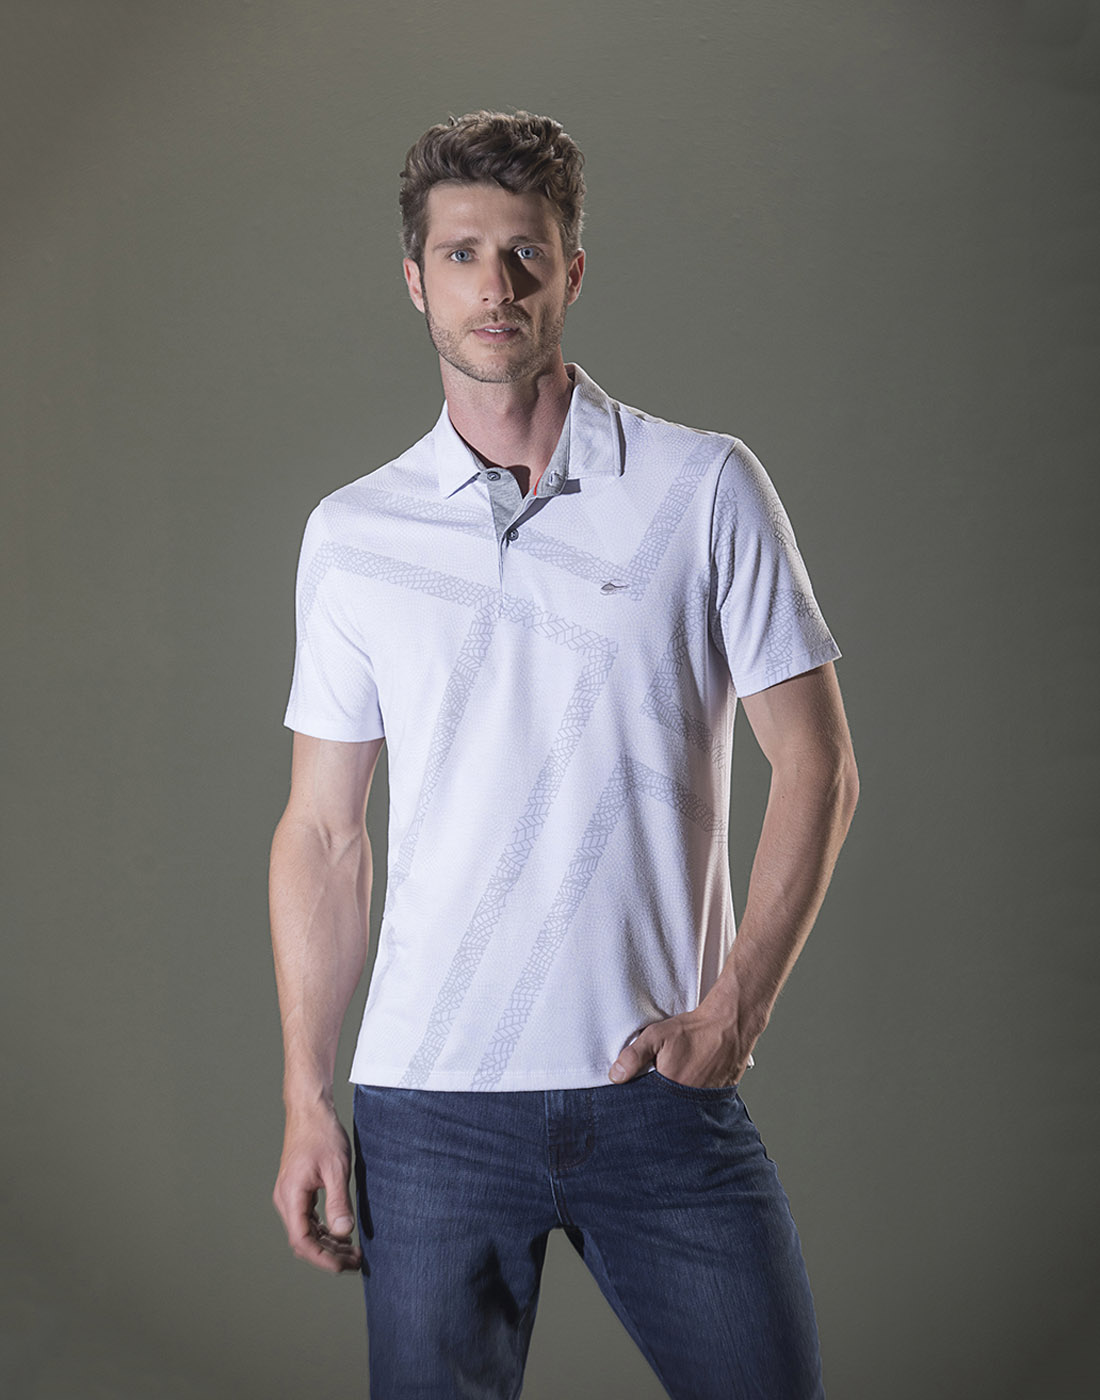 Camiseta Polo Estampada Branco Sallo